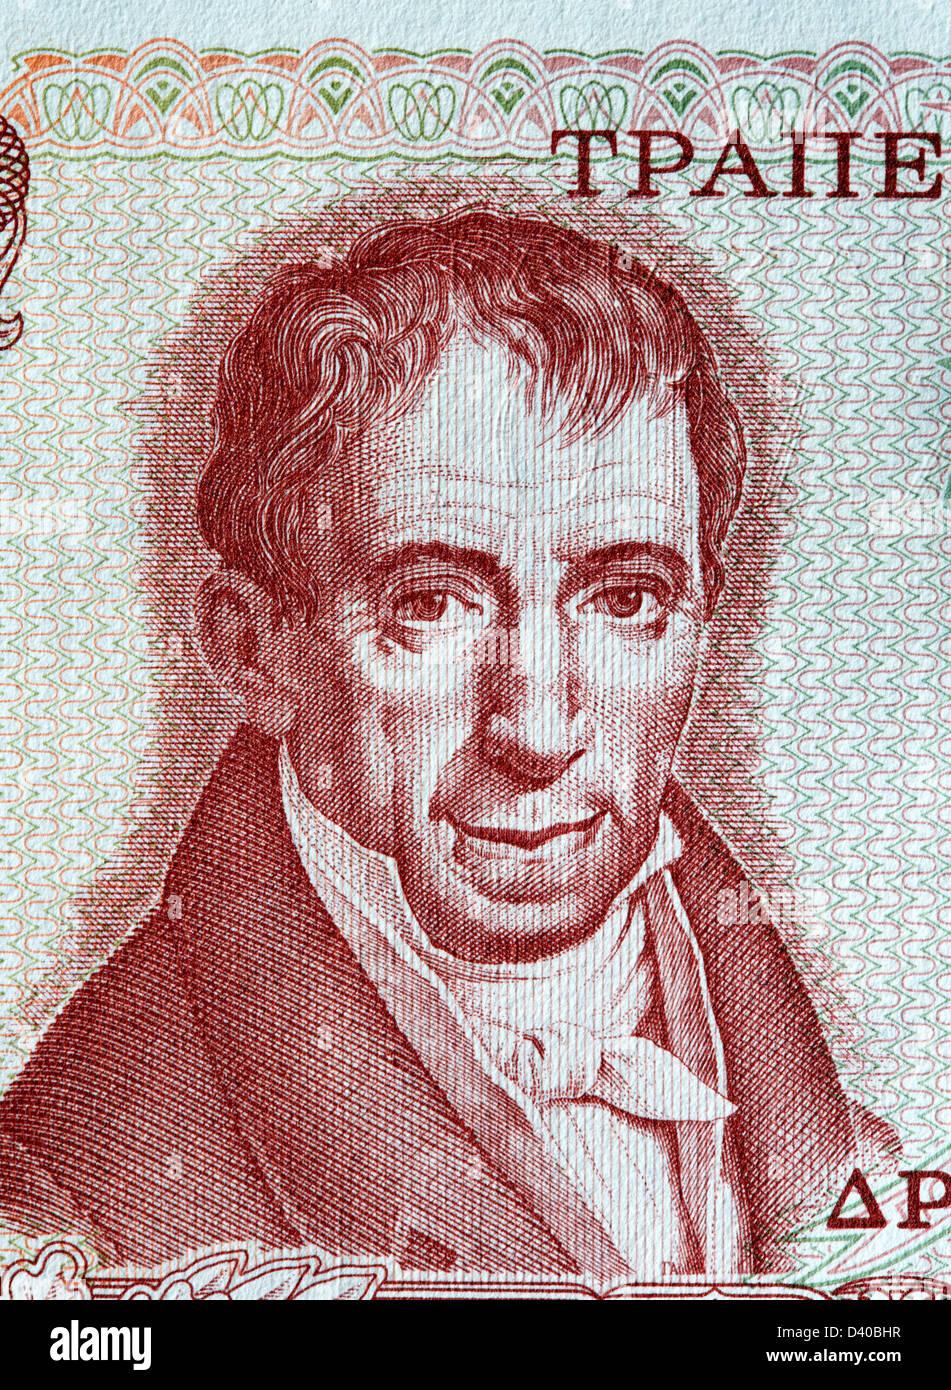 Portrait of Adamantios Korais from 100 Drachmas banknote, Greece, 1978 - Stock Image